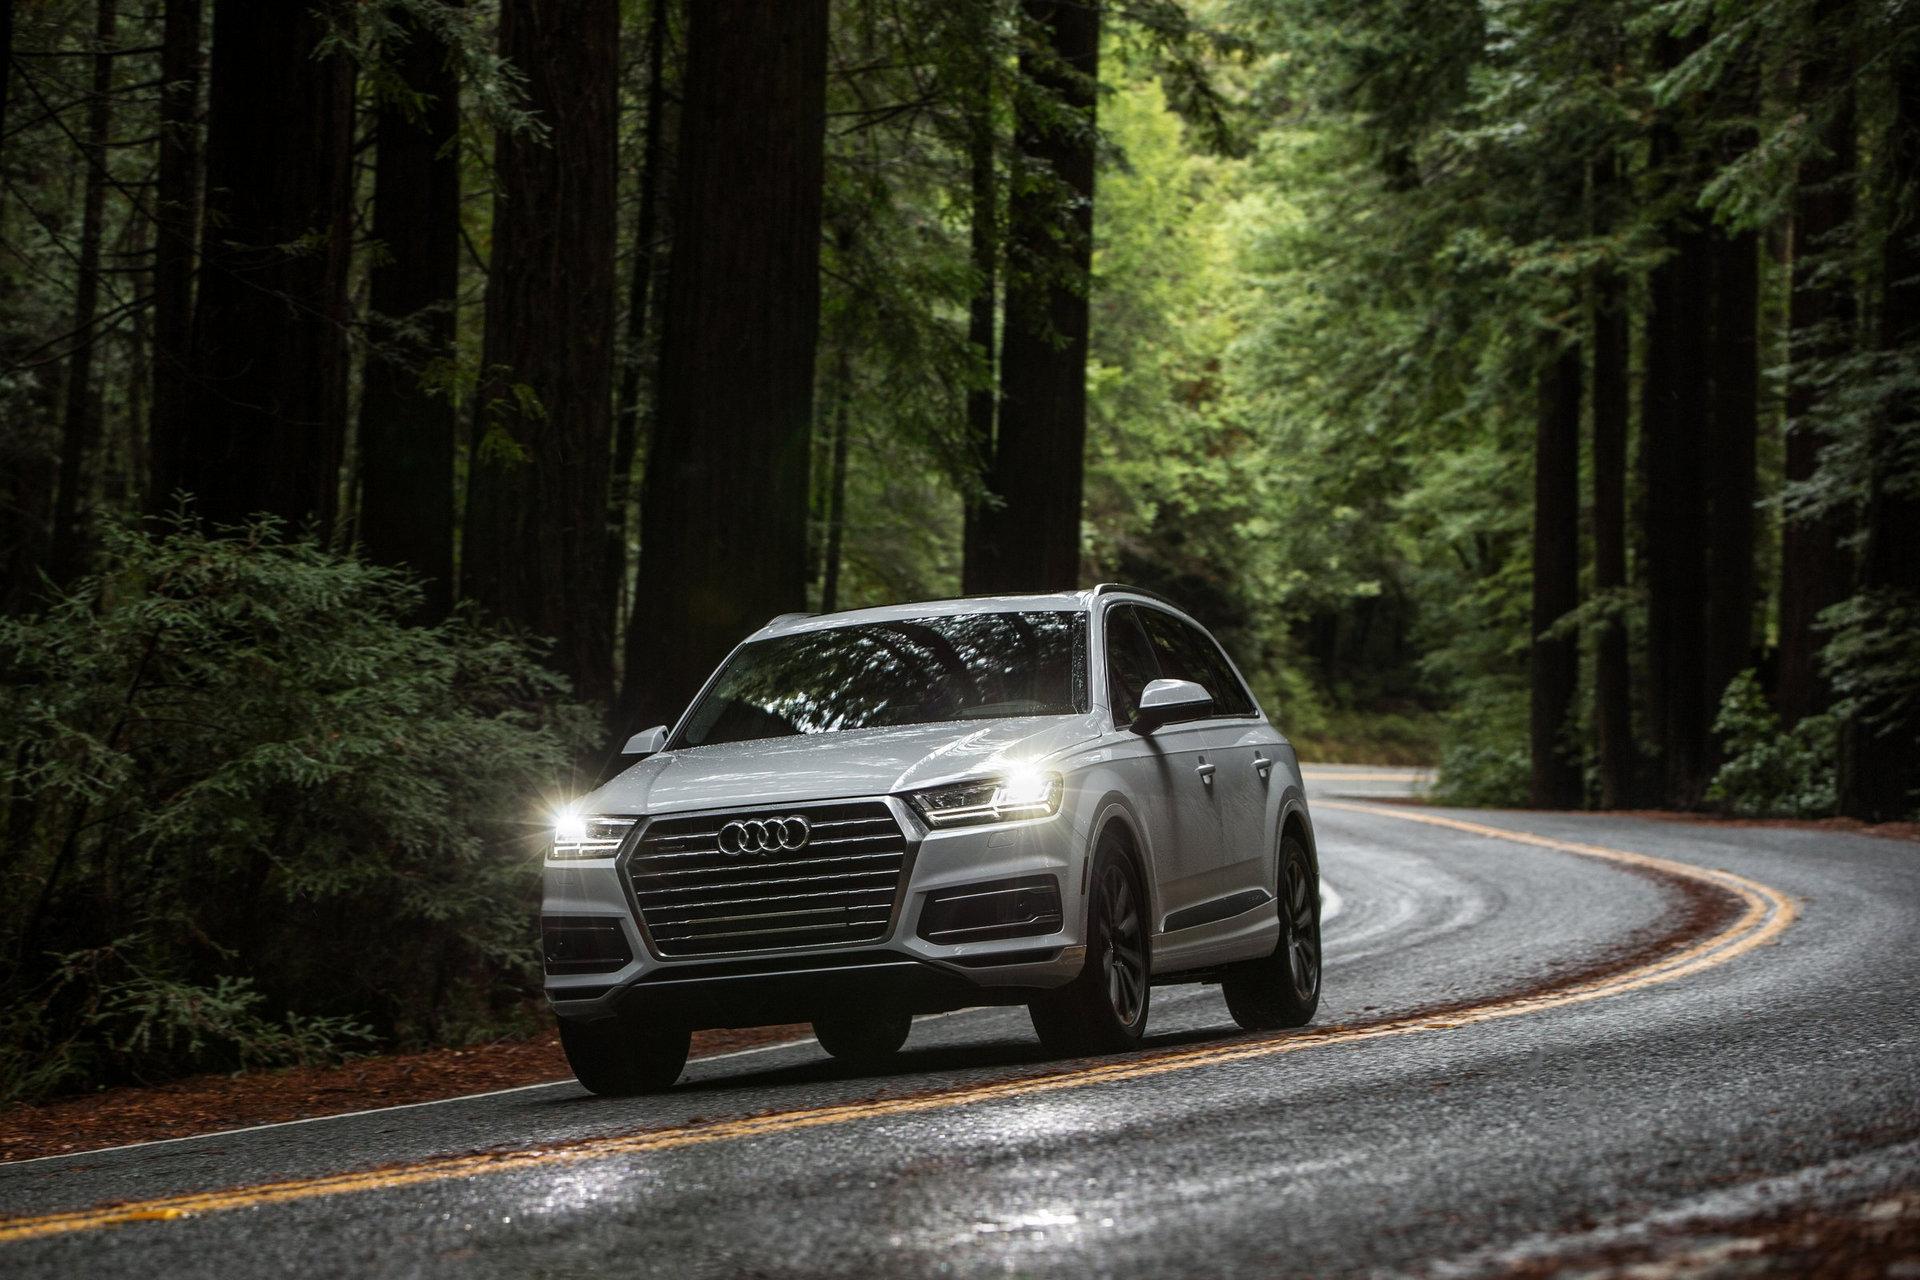 Best Luxury Midsize SUVs for 2016-2017